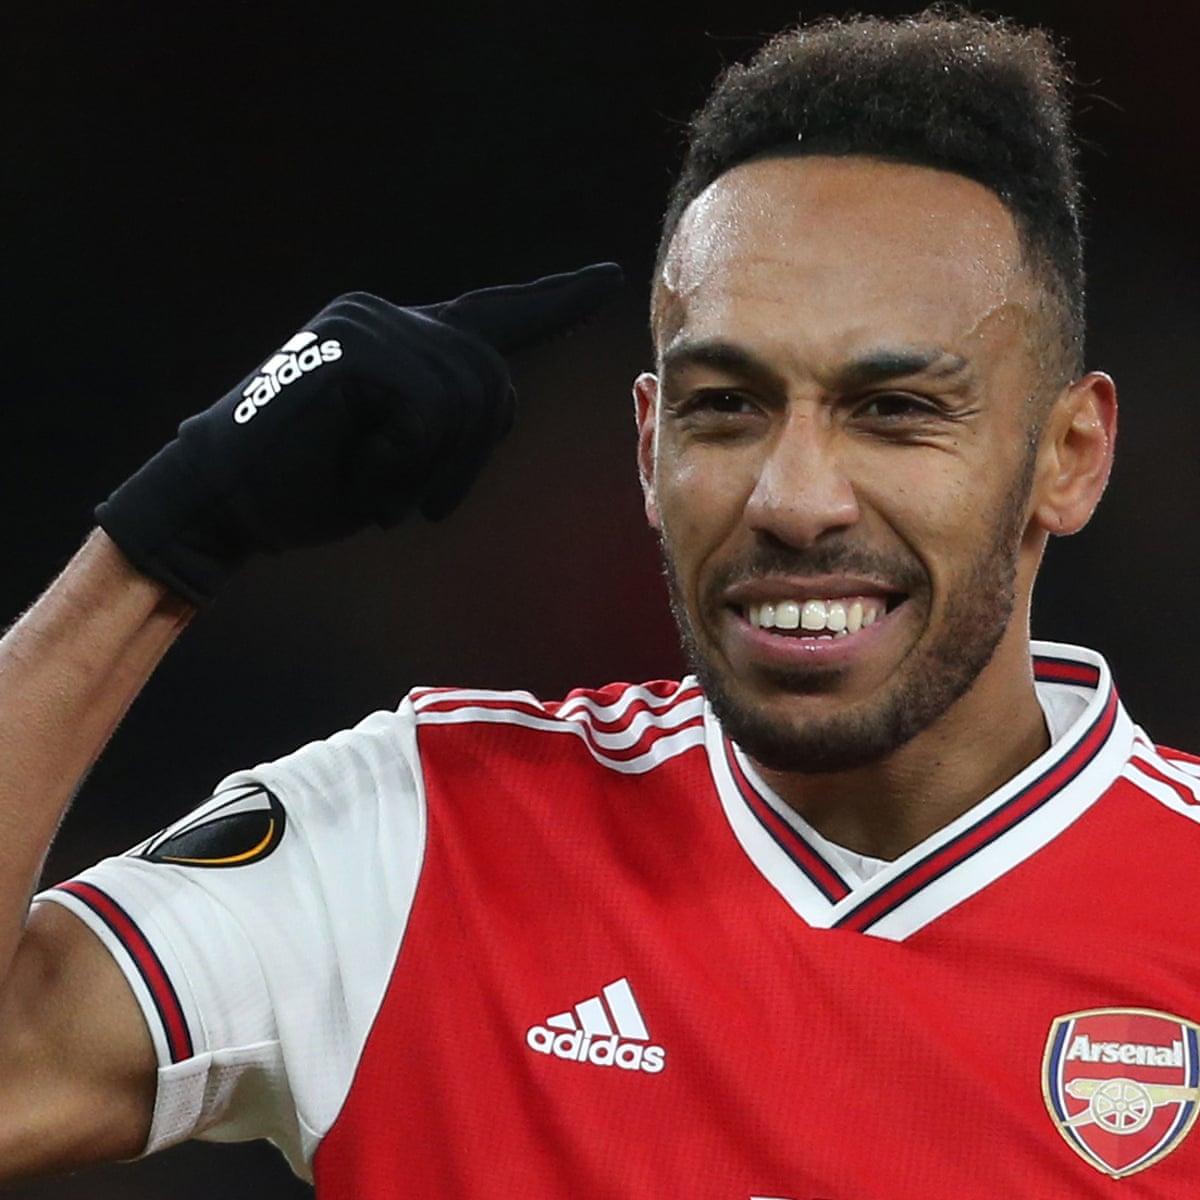 Football transfer rumours: Pierre-Emerick Aubameyang to Barcelona? |  Transfer window | The Guardian